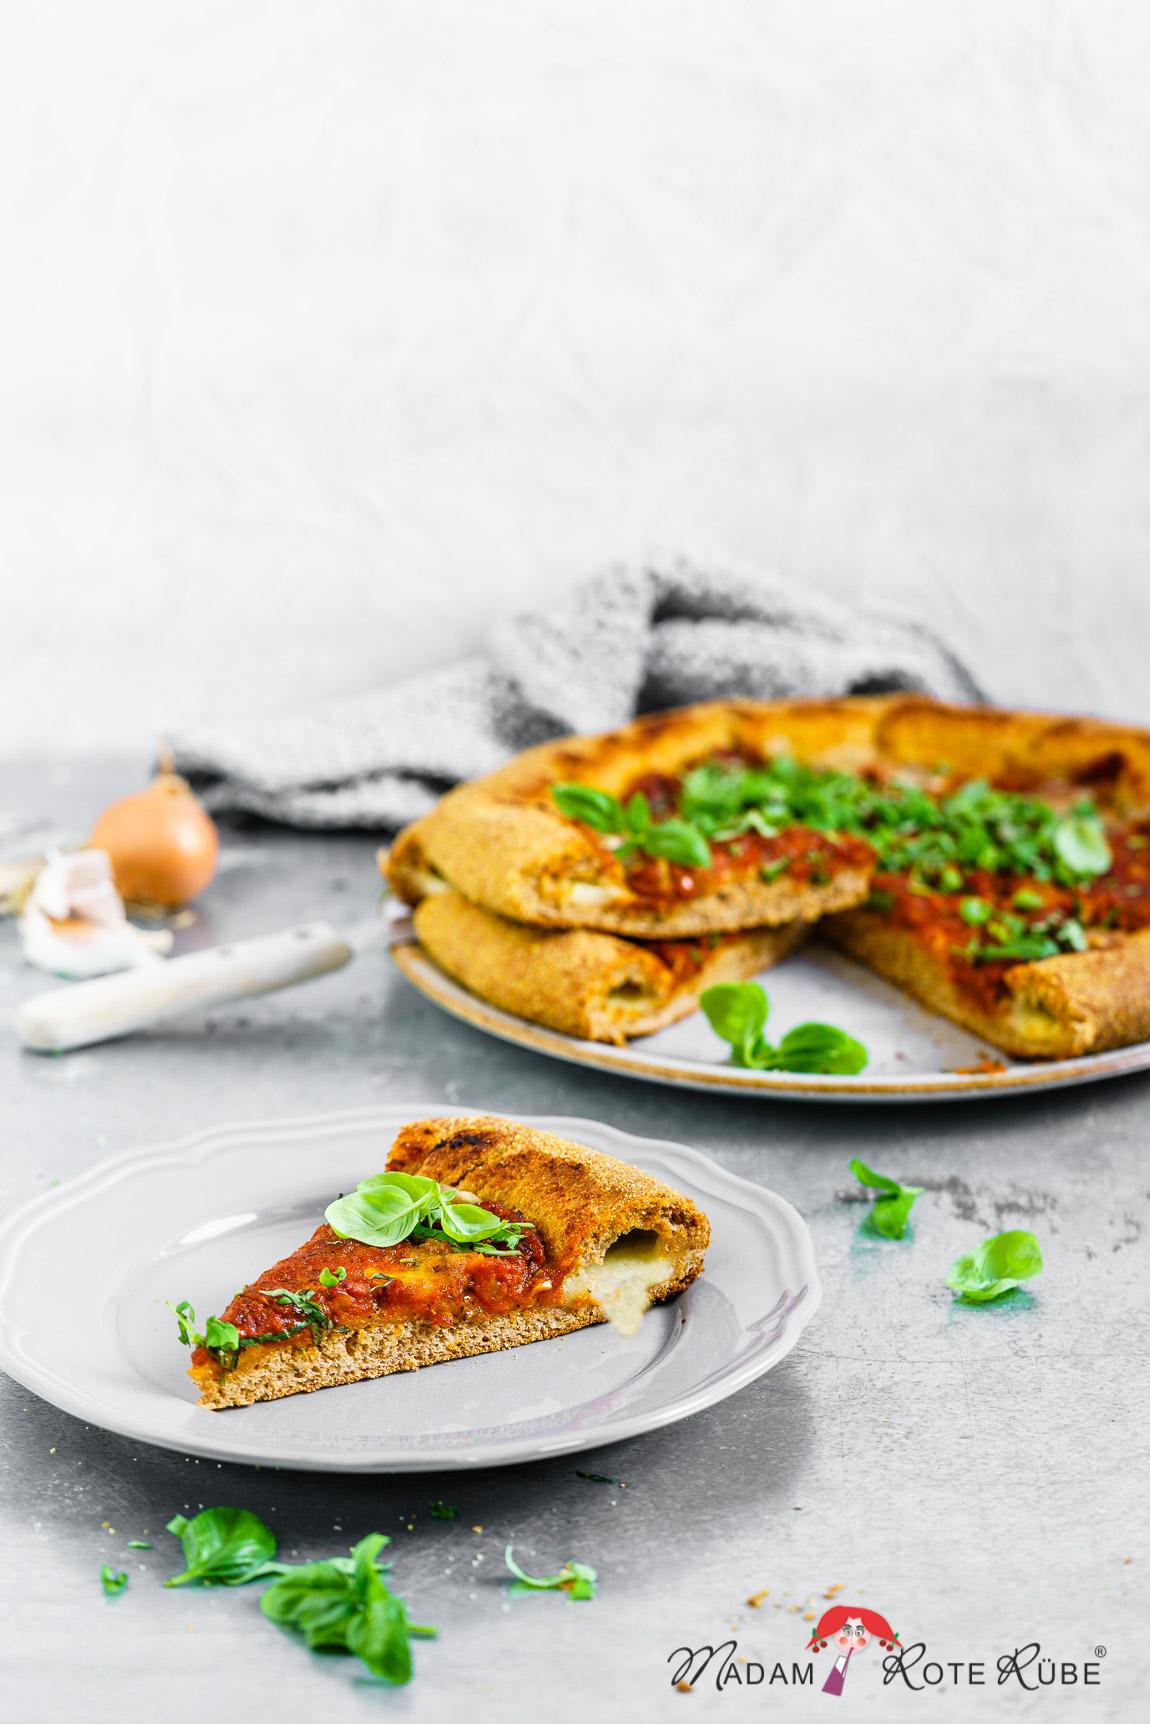 Madam Rote Rübe -Knusprige American-Vollkorn-Pizza mit Mozzarella-Käserand